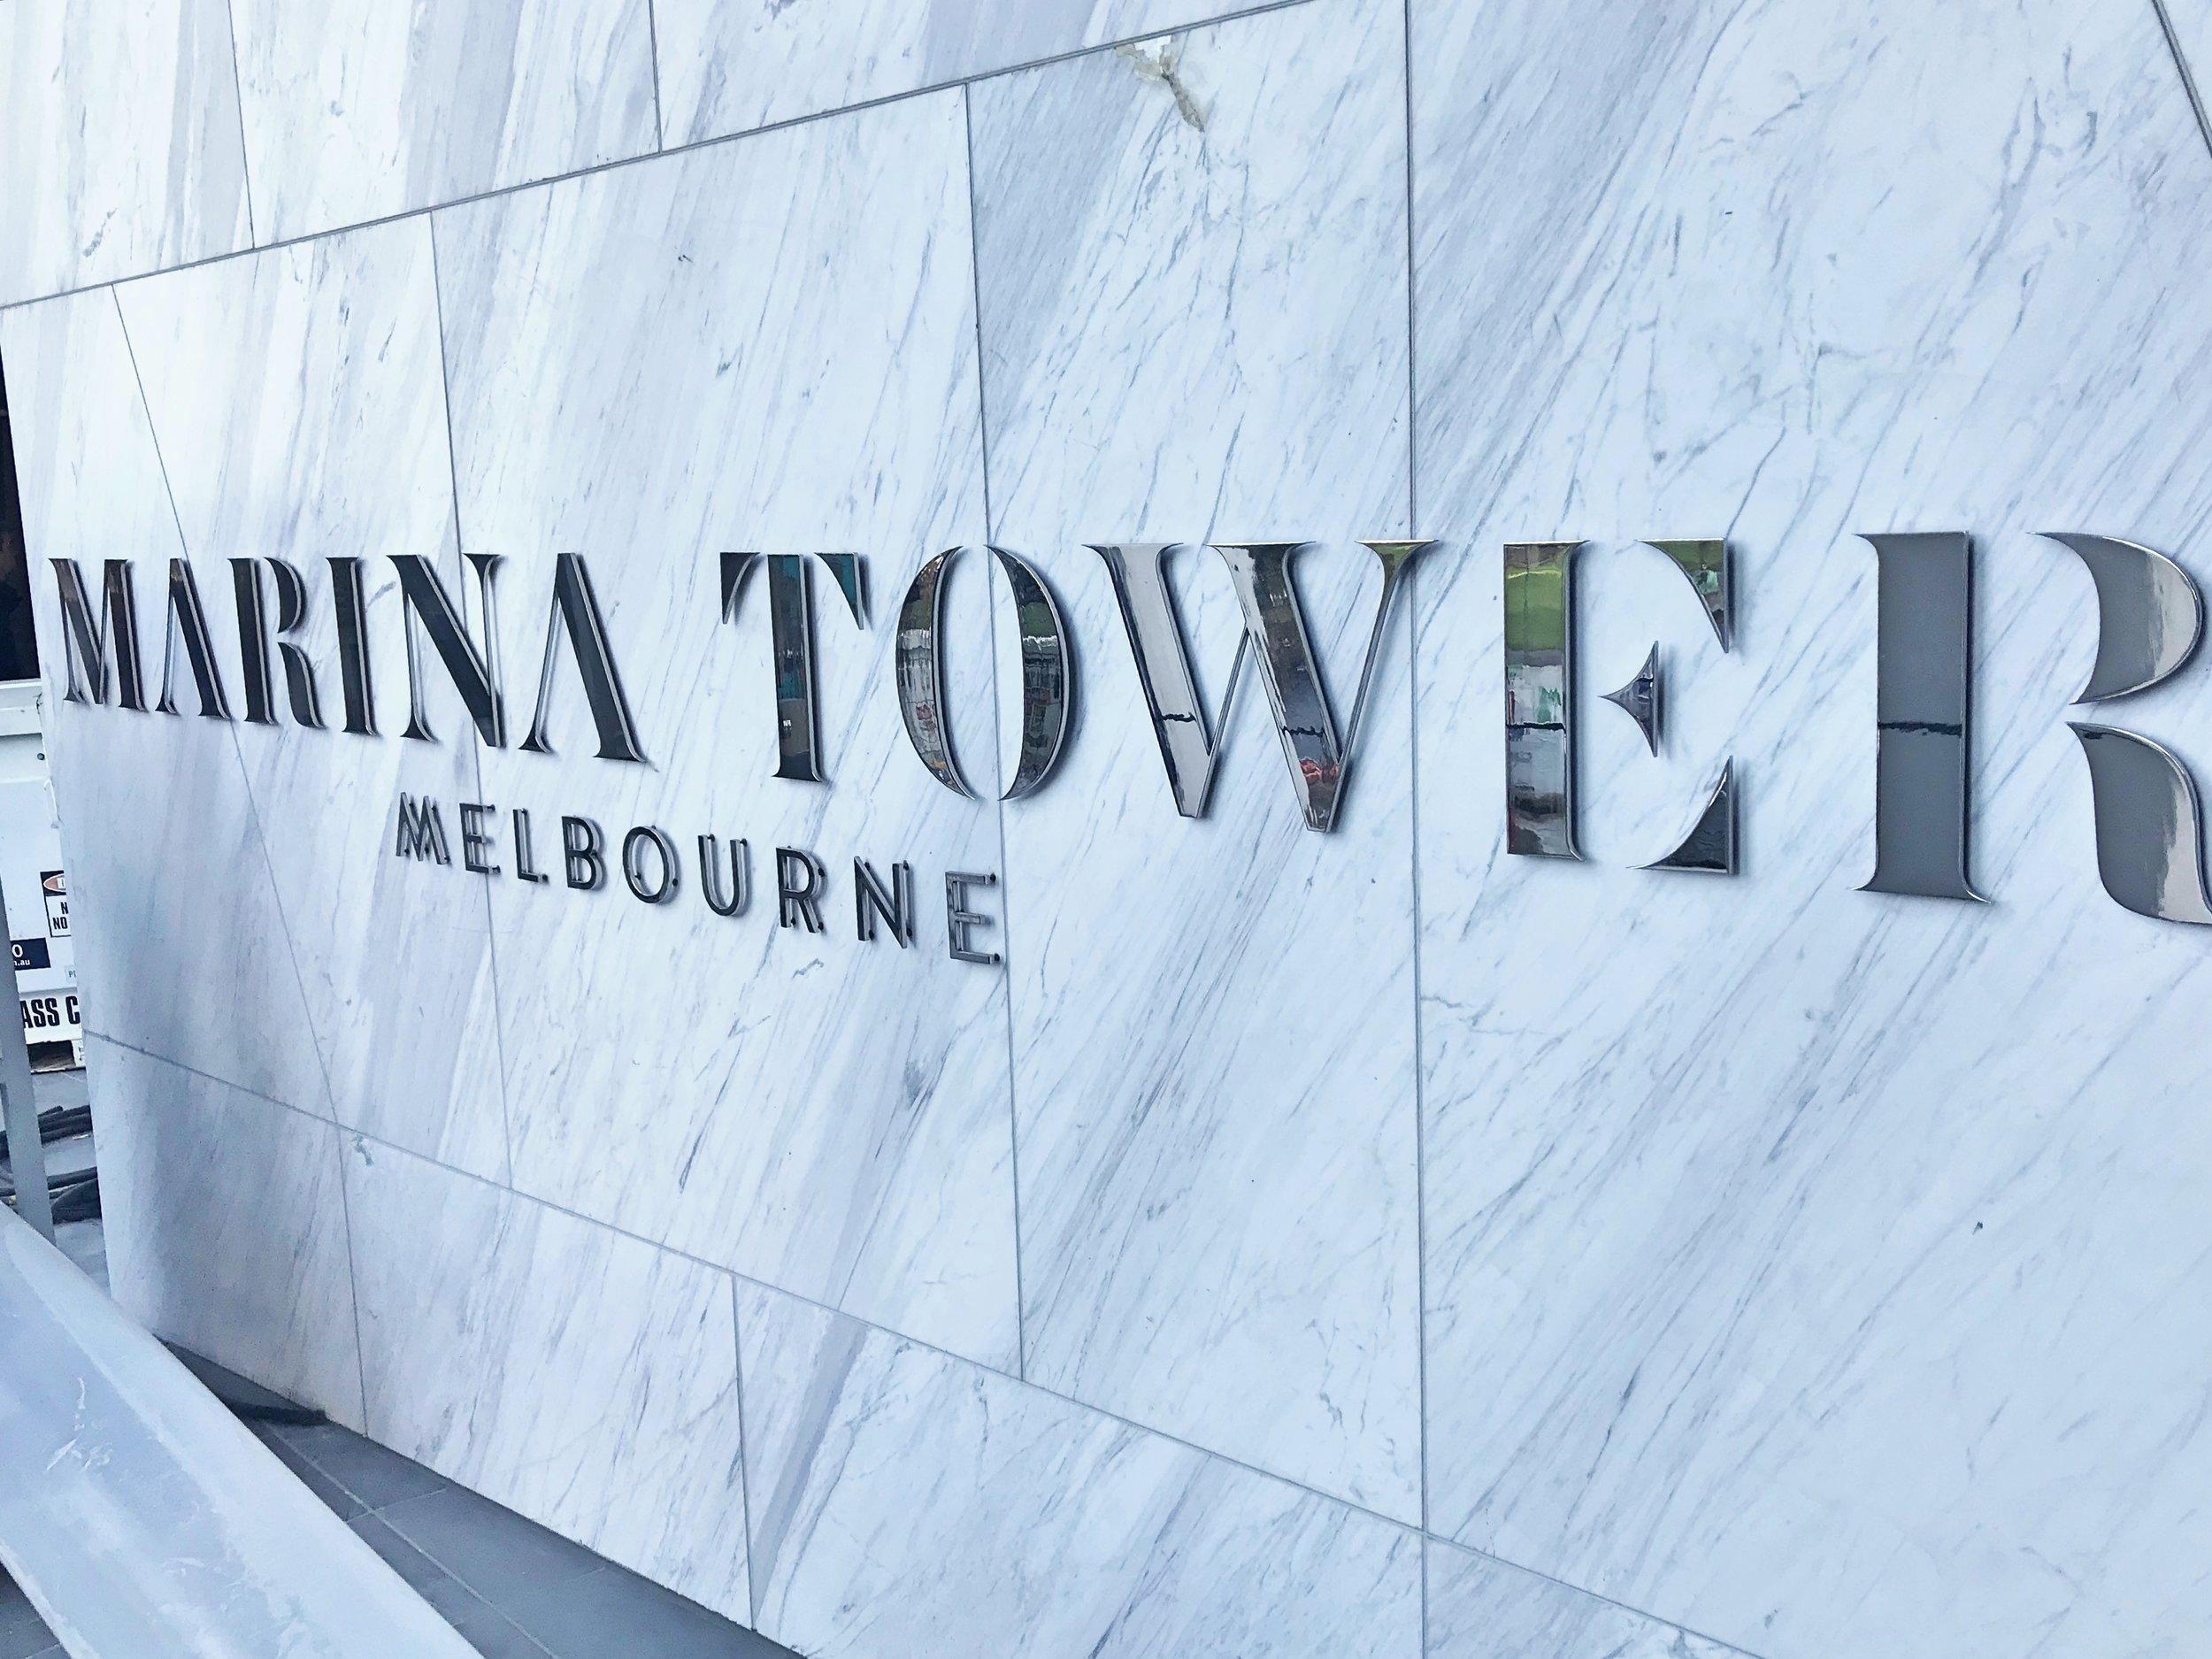 2017-10-30 Marina Tower (1).JPG